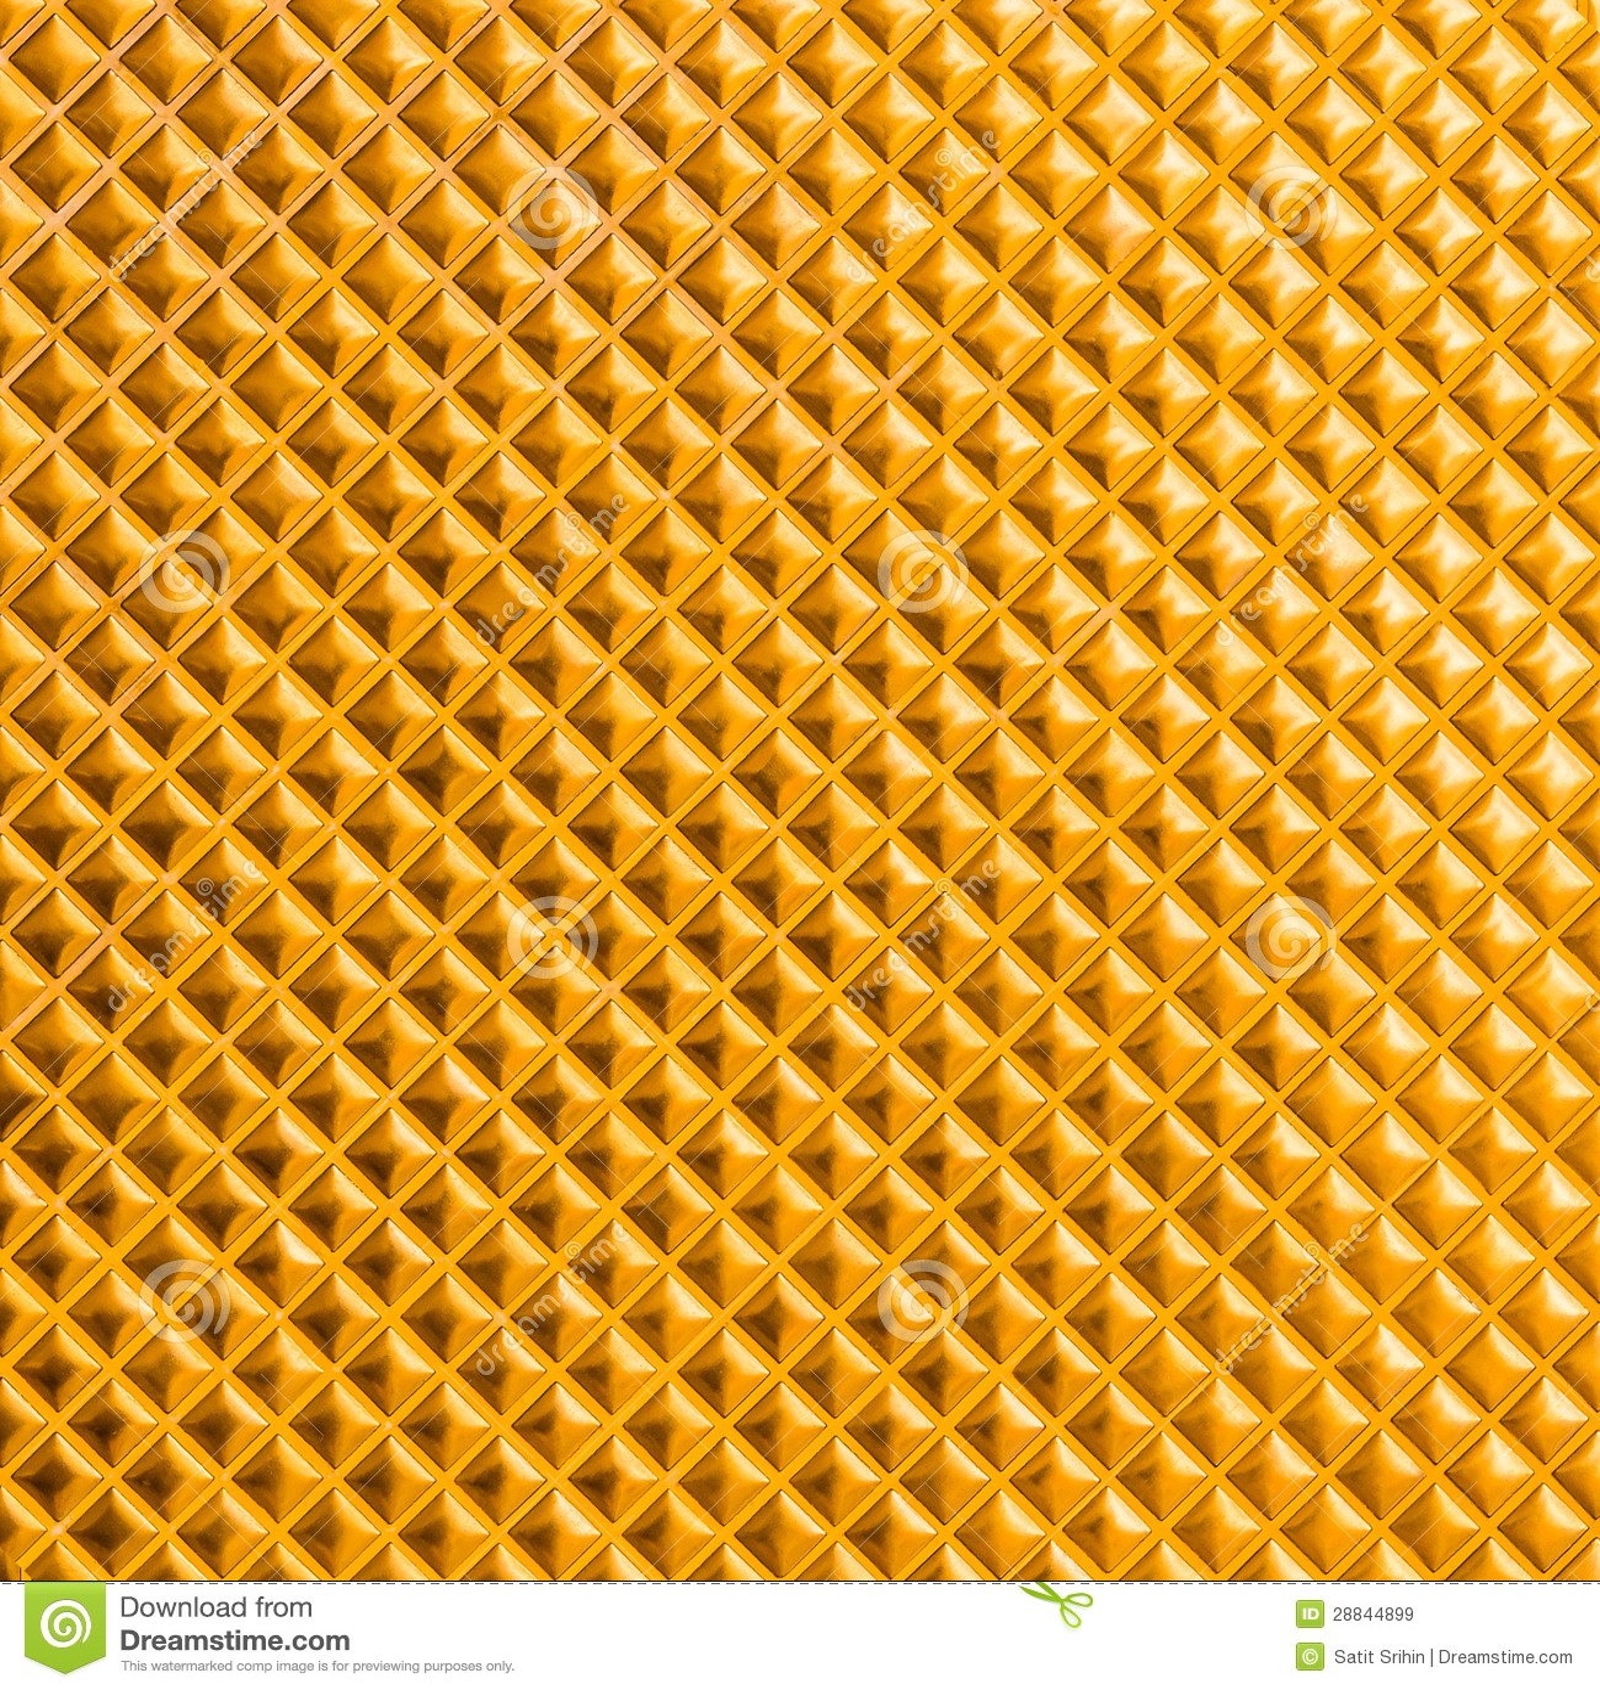 Gold Mosaic Tiles Texture Stock Image Image Of Design